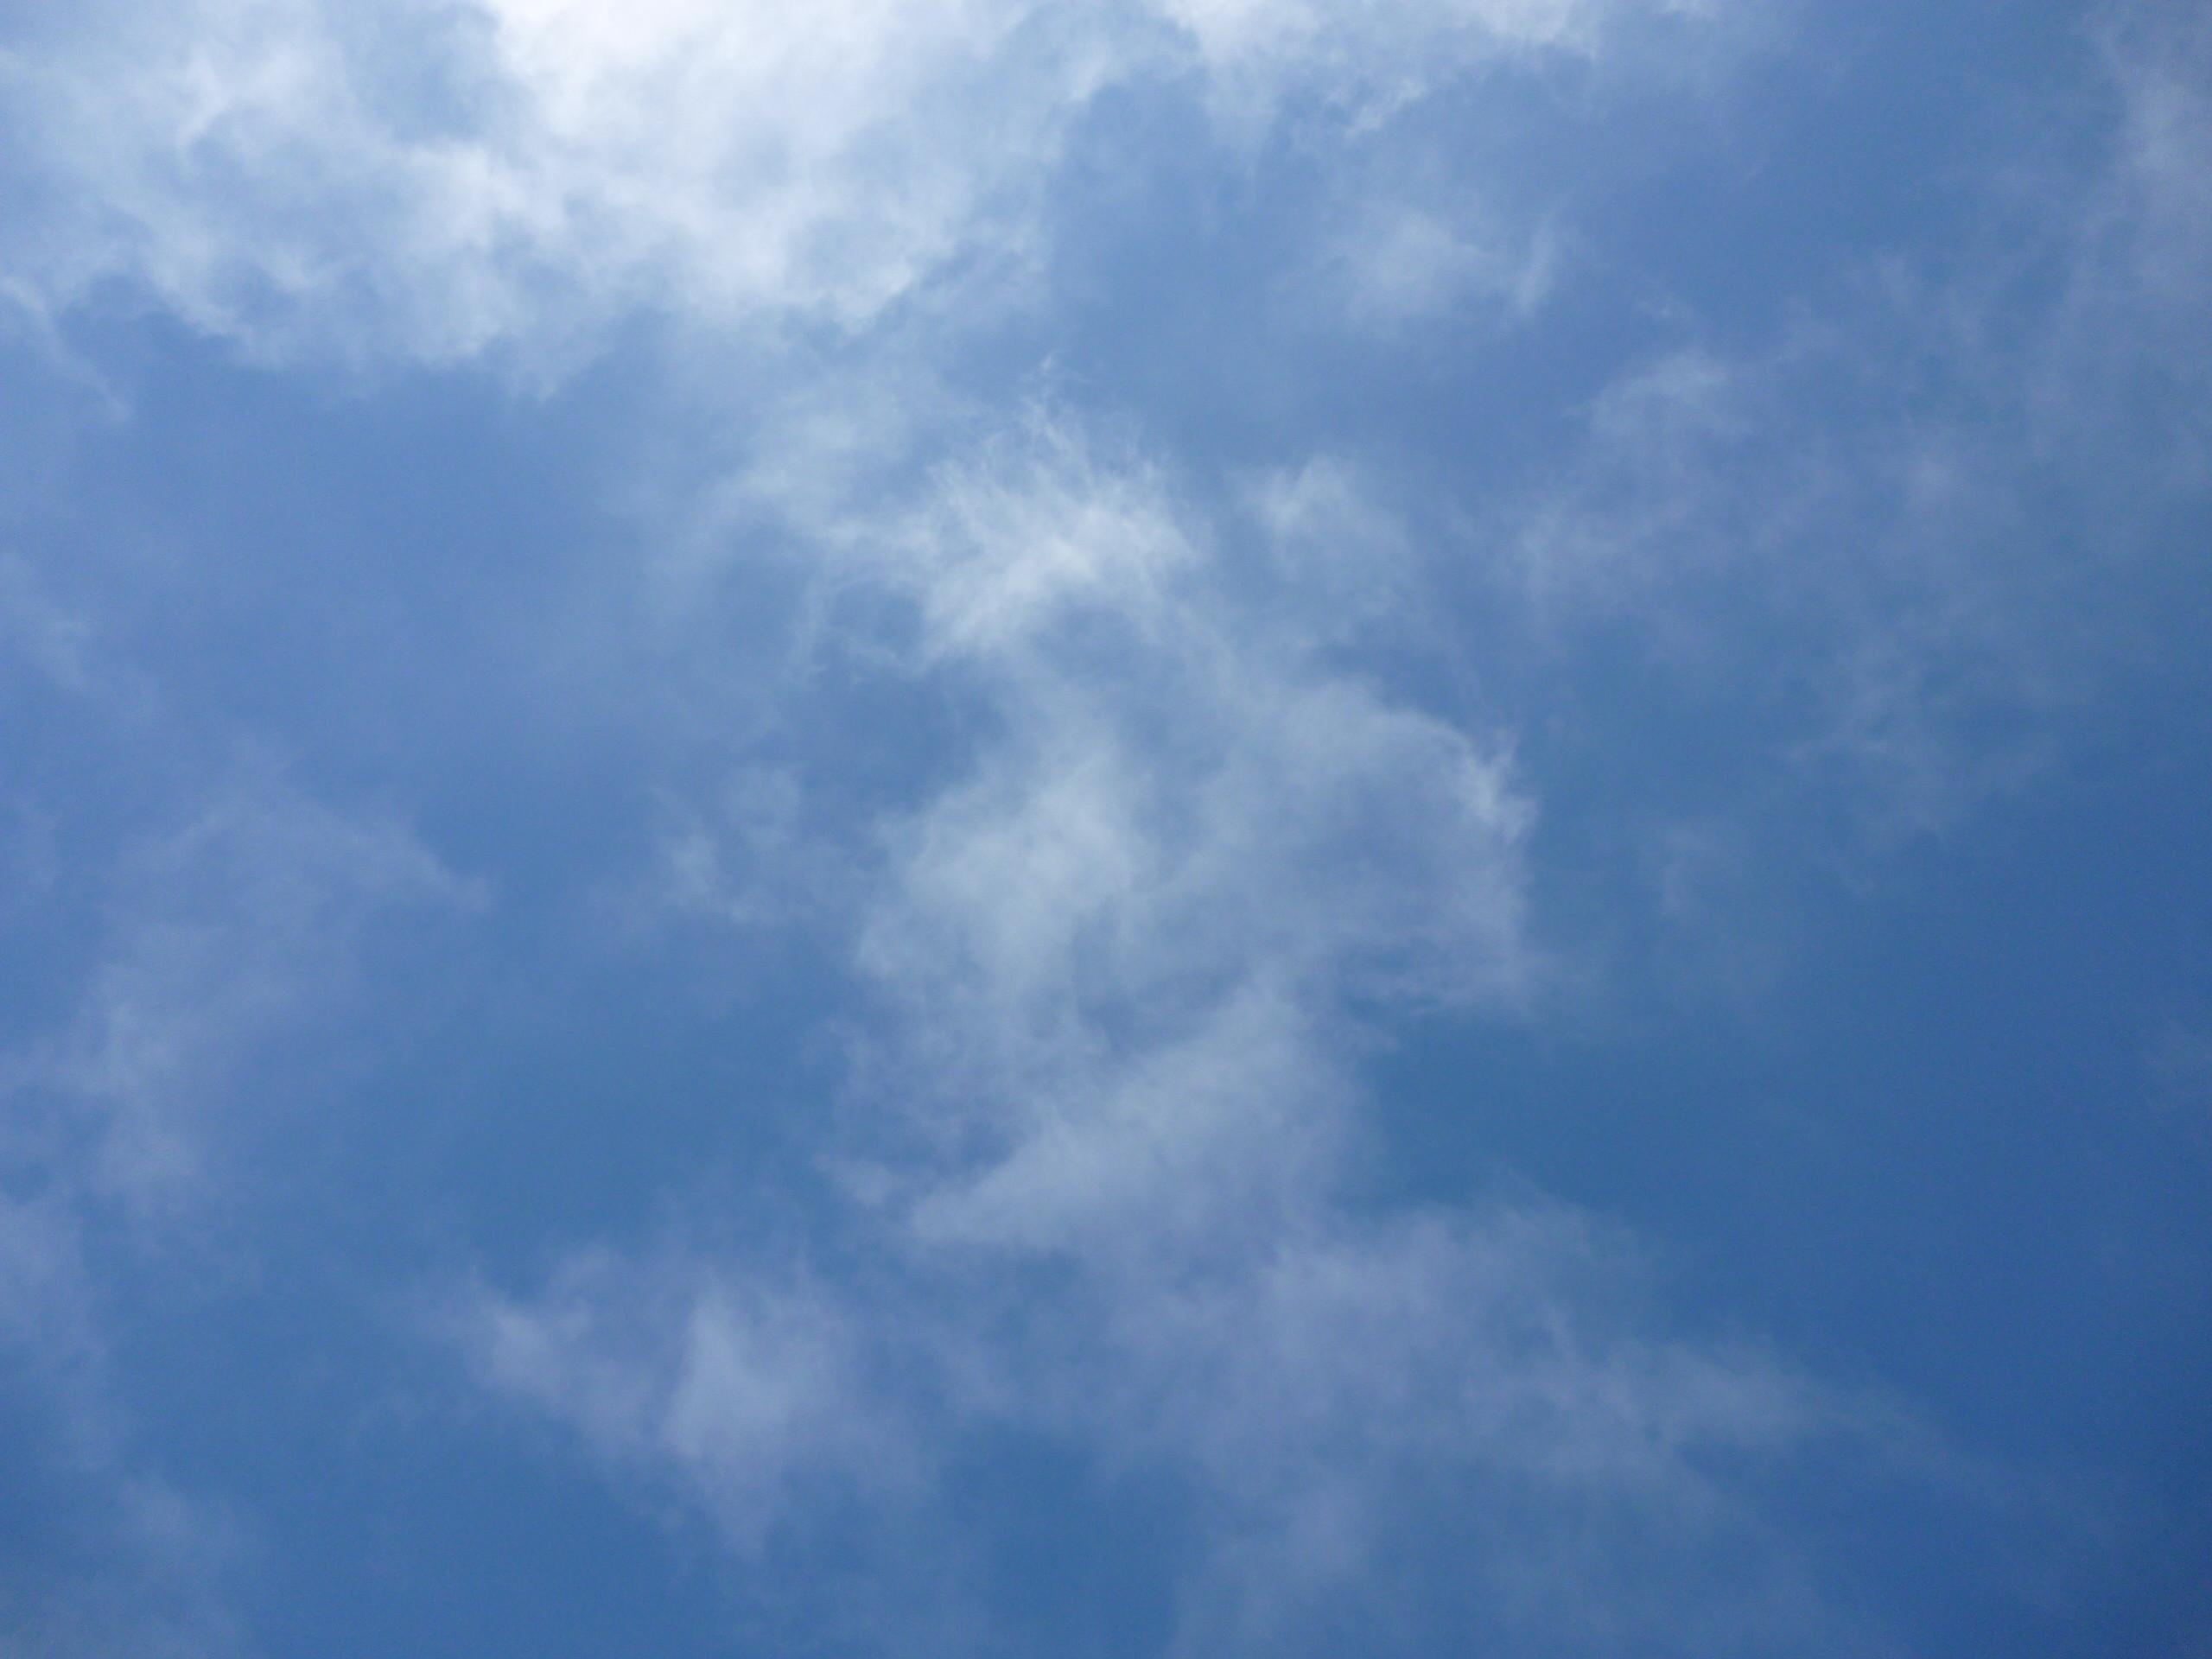 File:Blue sky with wisps of cloud.JPG – Wikimedia Commons